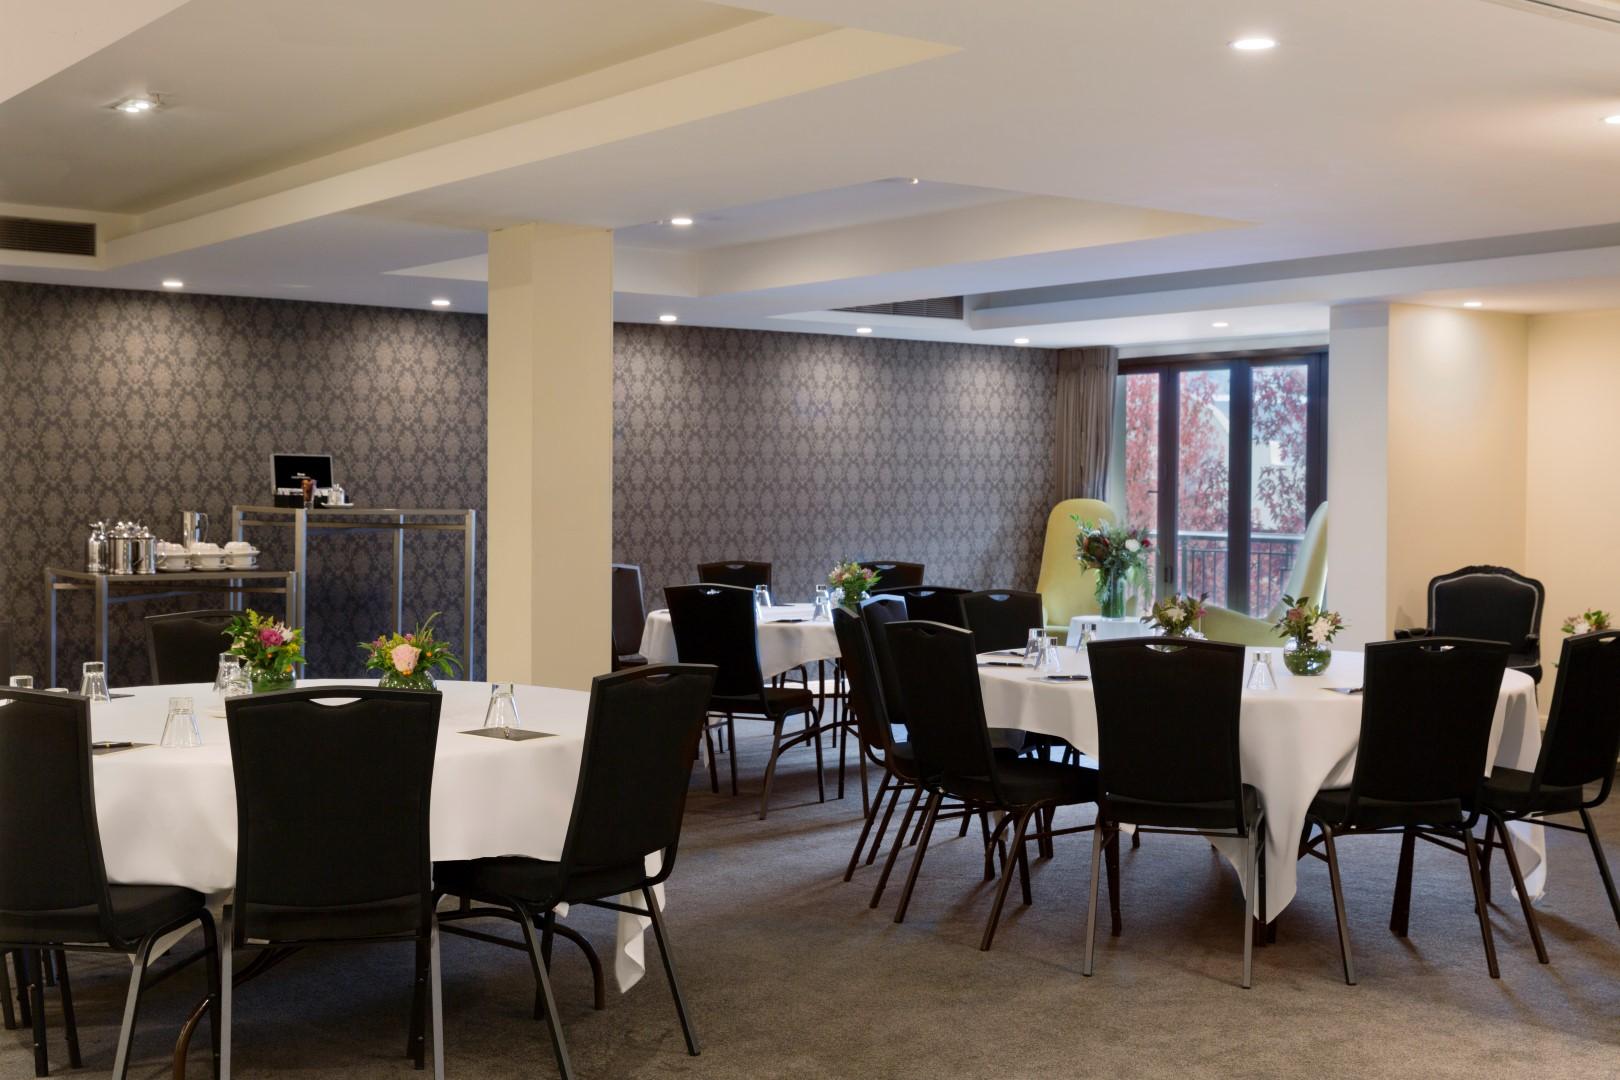 The-Ambassador-Room-Banquet-4MB-Large.jpg